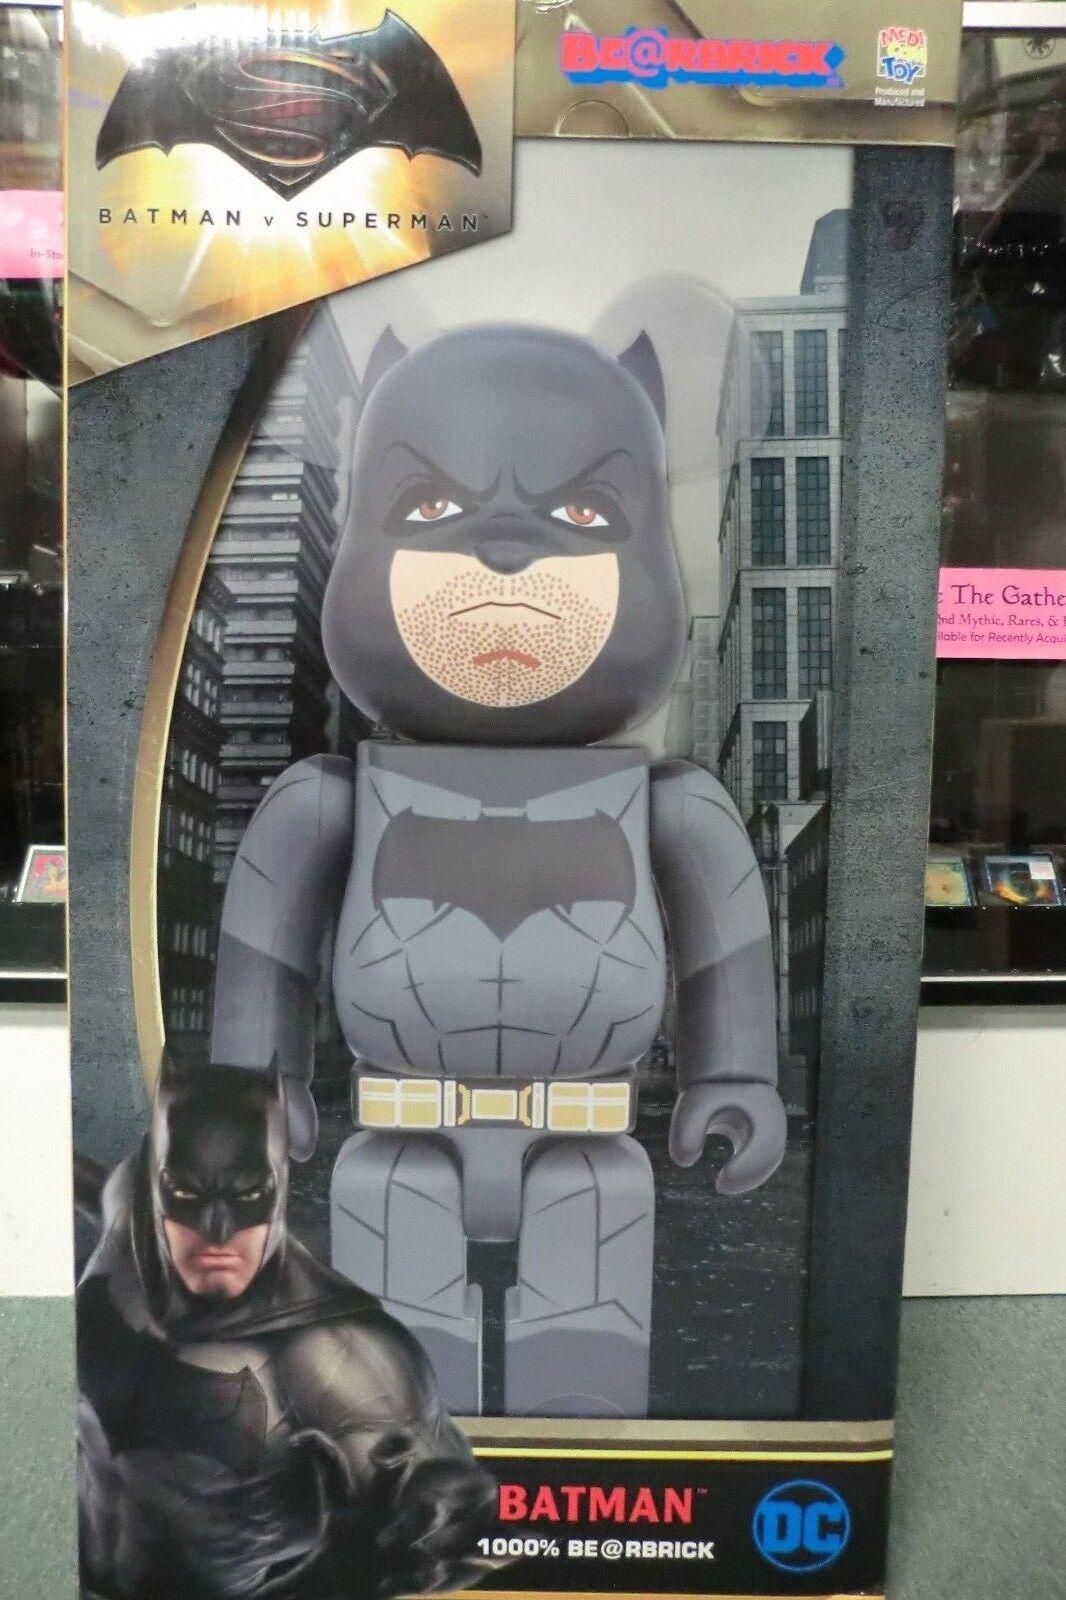 Medicom Batman Vs Superman BVS amanecer de la justicia Bearbrick 1000% Nuevo